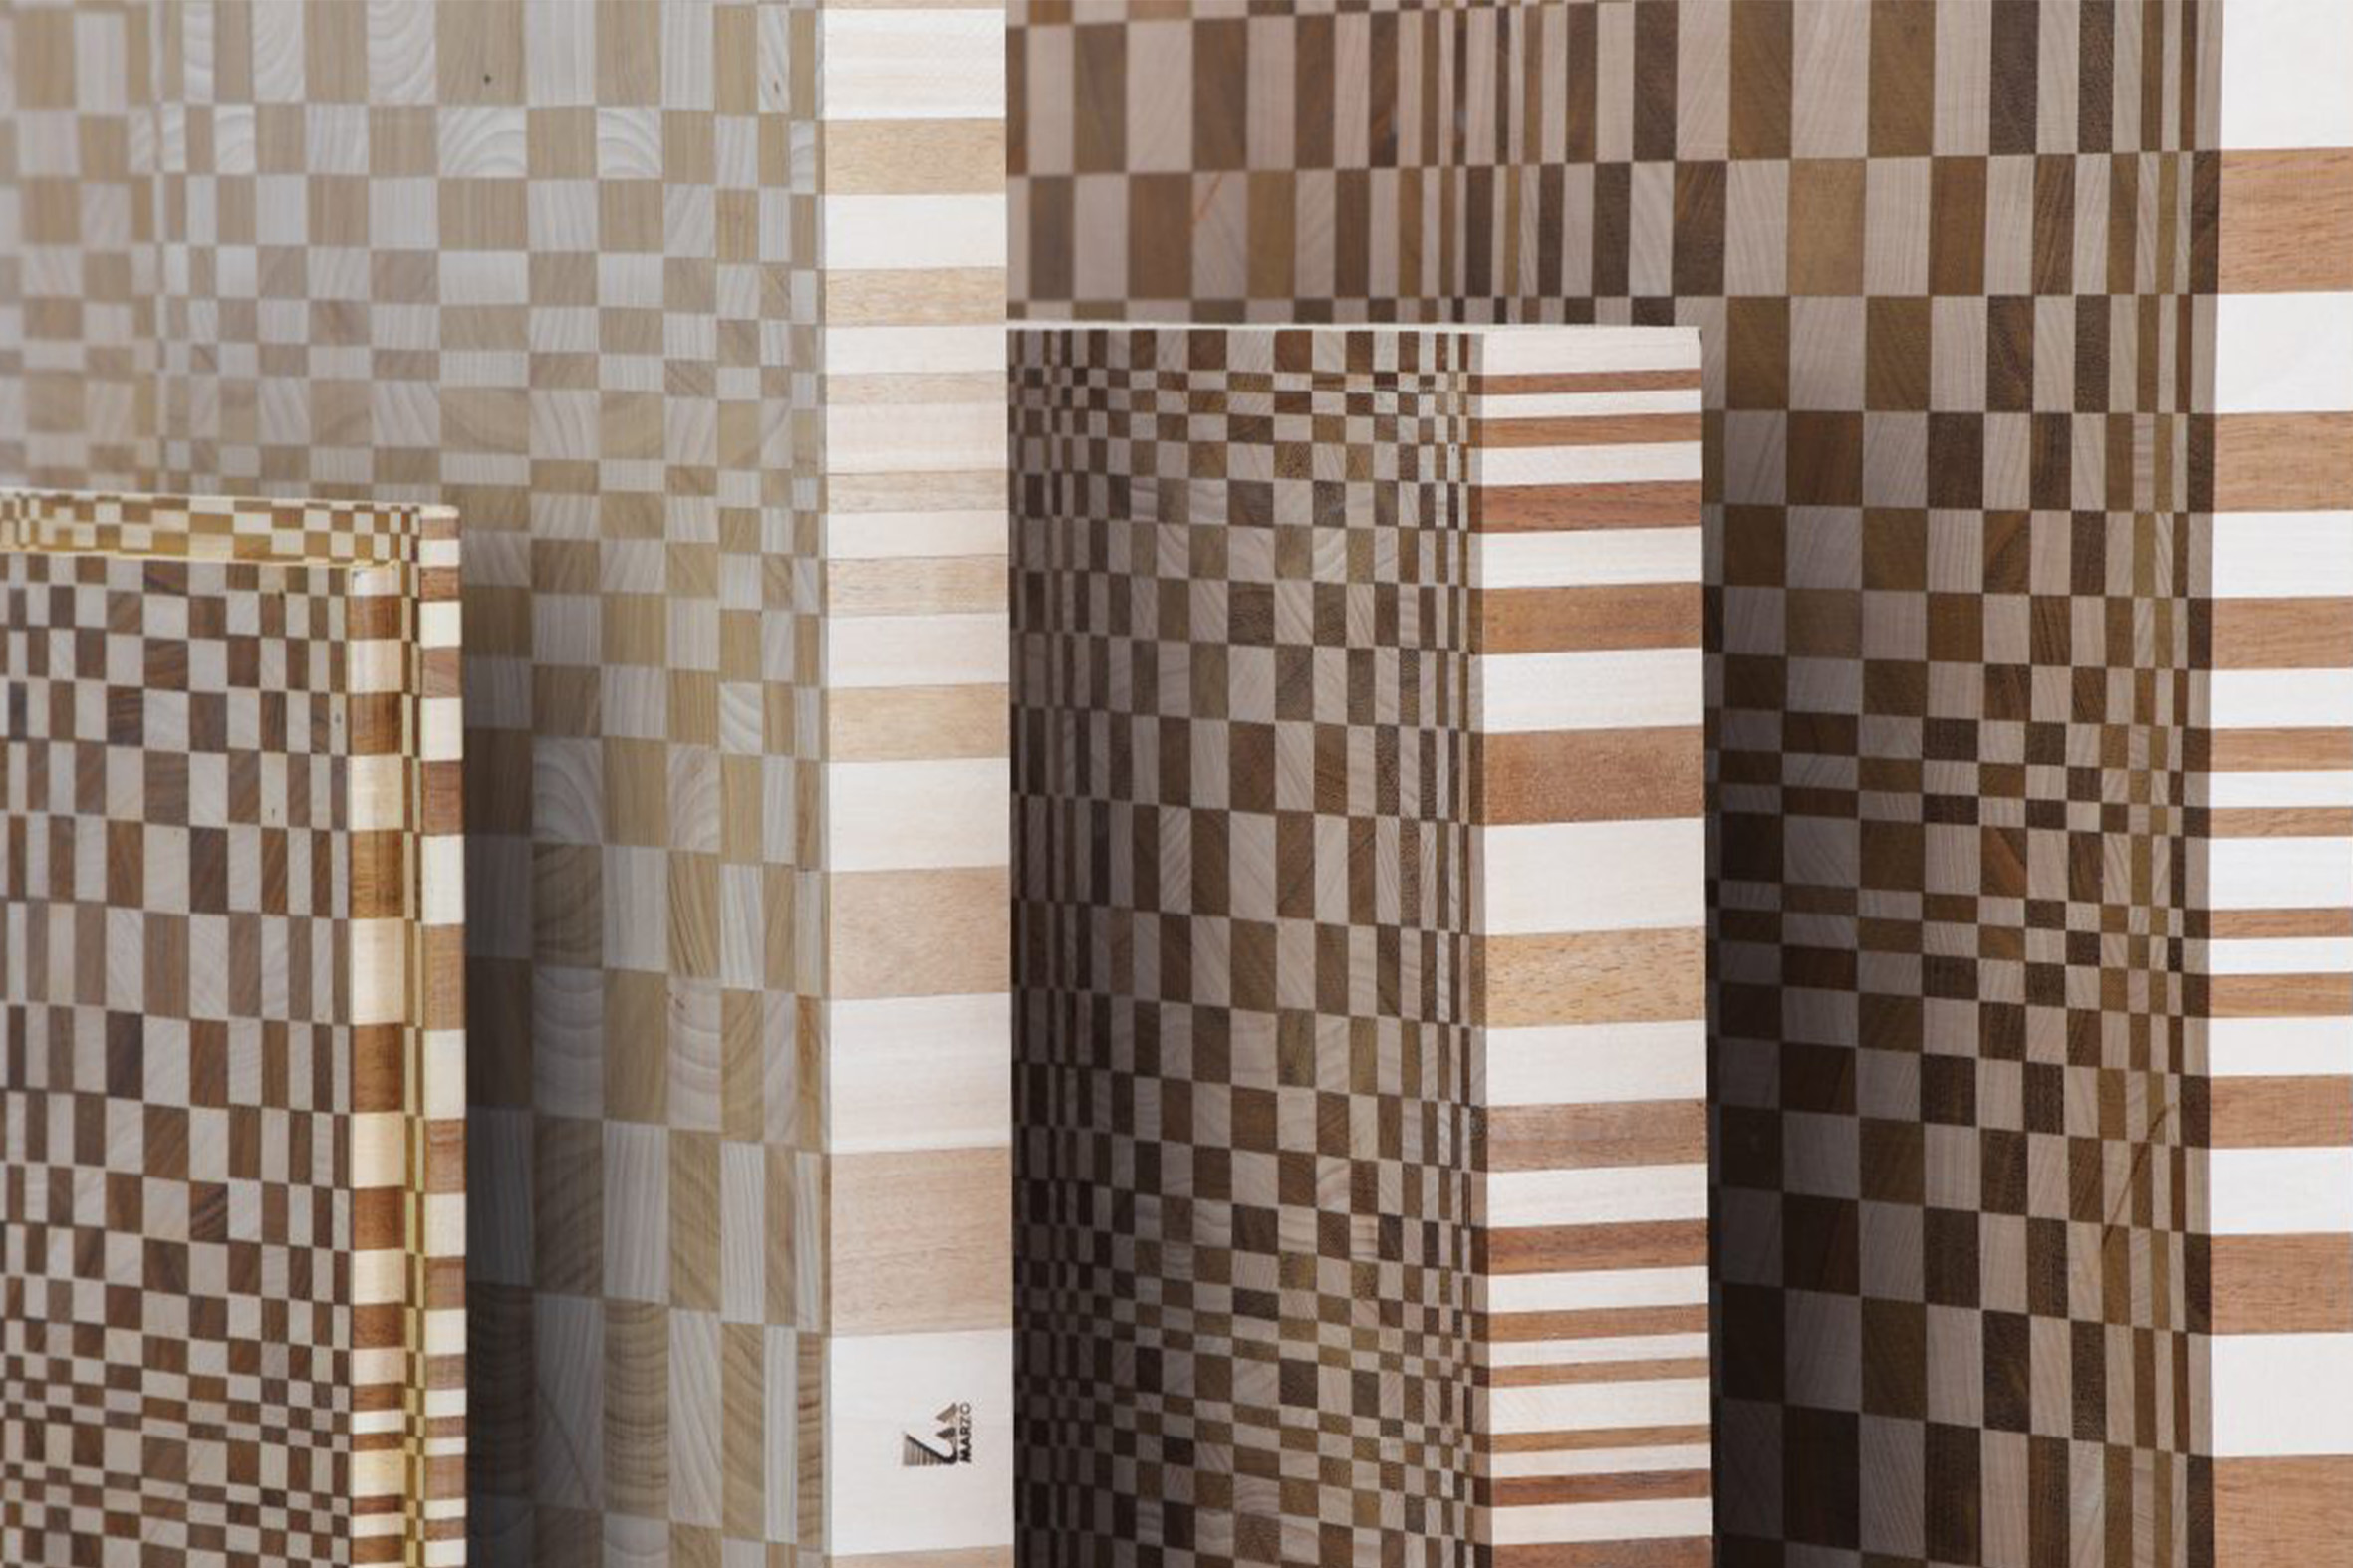 Optic pezzi legno 3